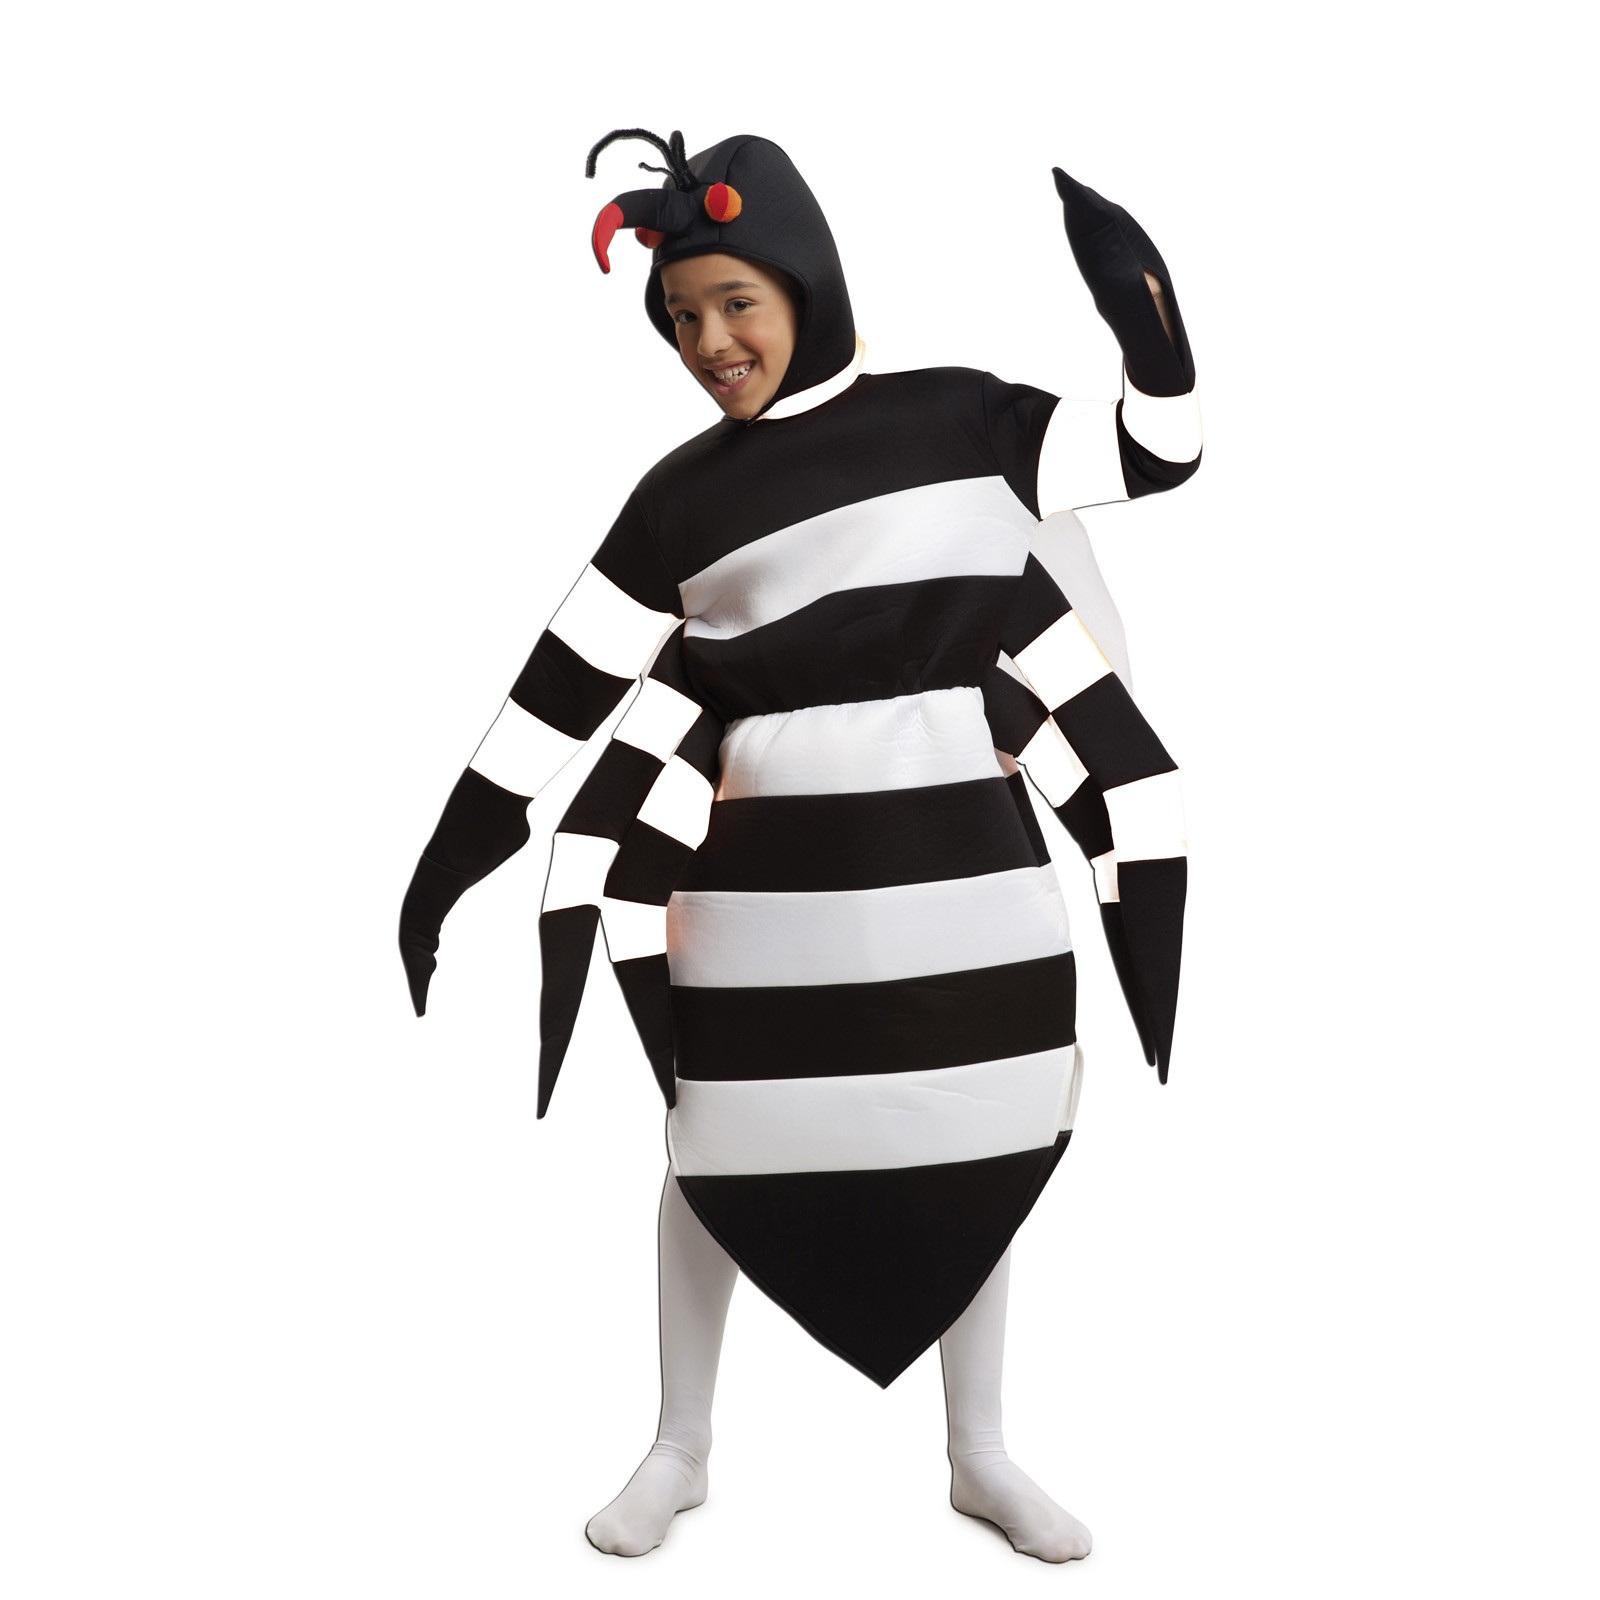 disfraz mosquito tigre niño 203728mom - DISFRAZ DE MOSQUITO TIGRE INFANTIL